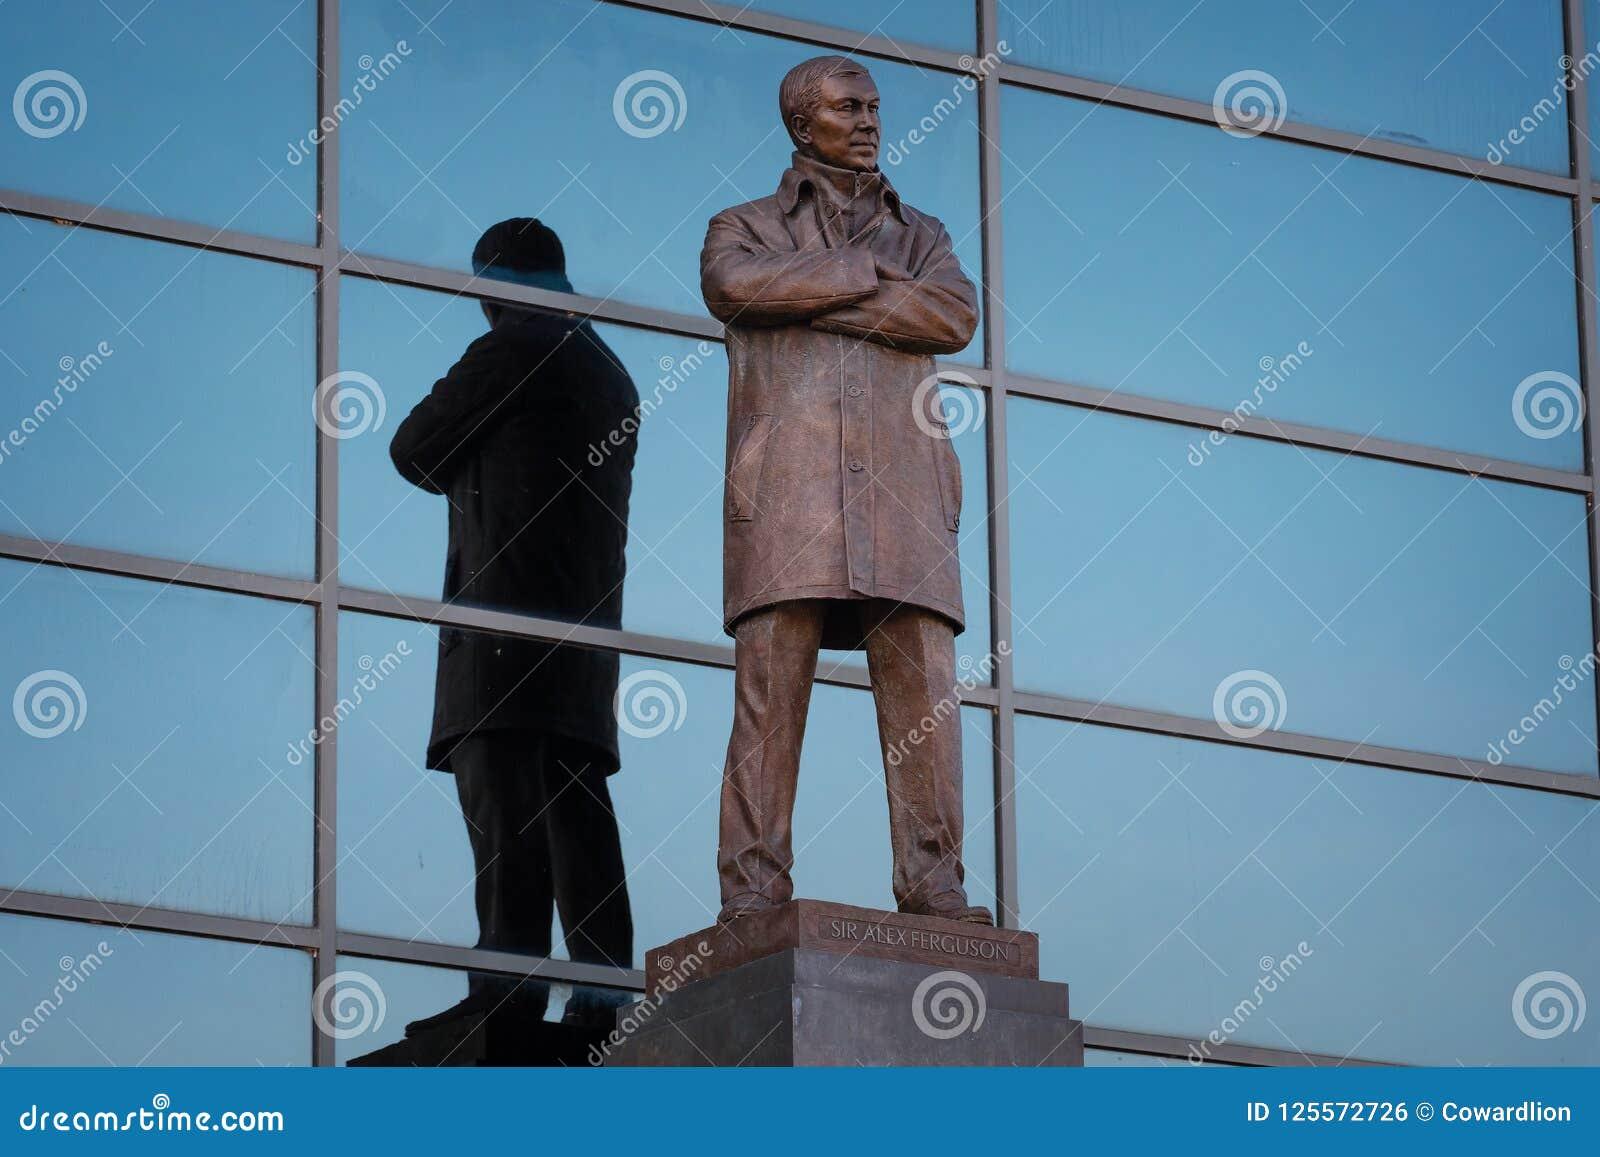 Sir Alex Ferguson Bronze Statue At Old Trafford Stadium In ...